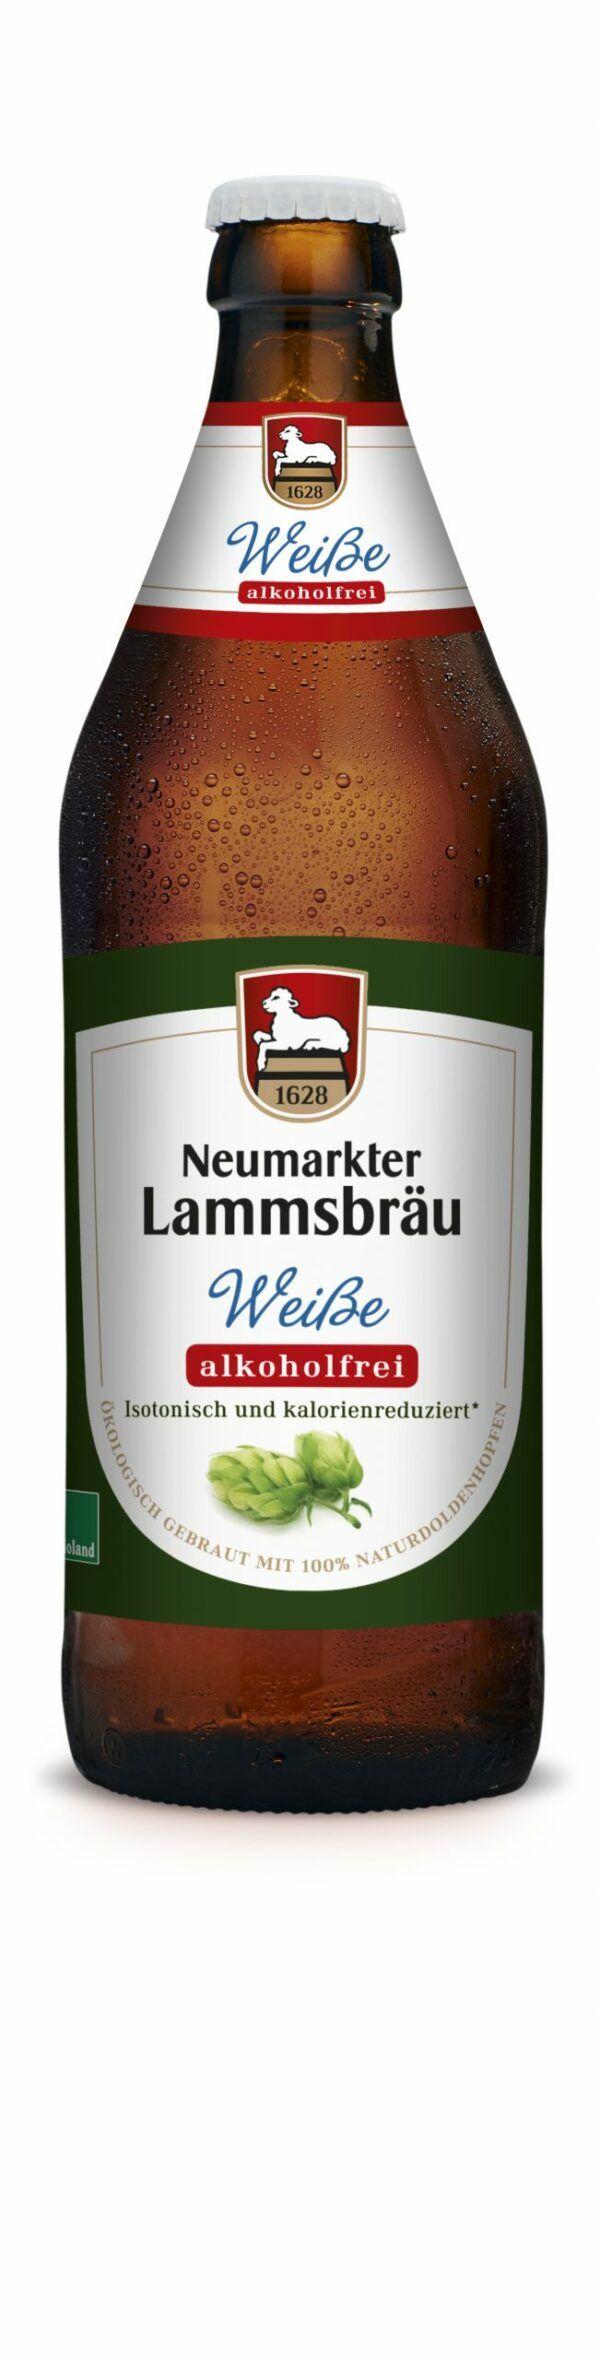 Neumarkter Lammsbräu Lammsbräu Weiße Alkoholfrei (Bio) 0,5l